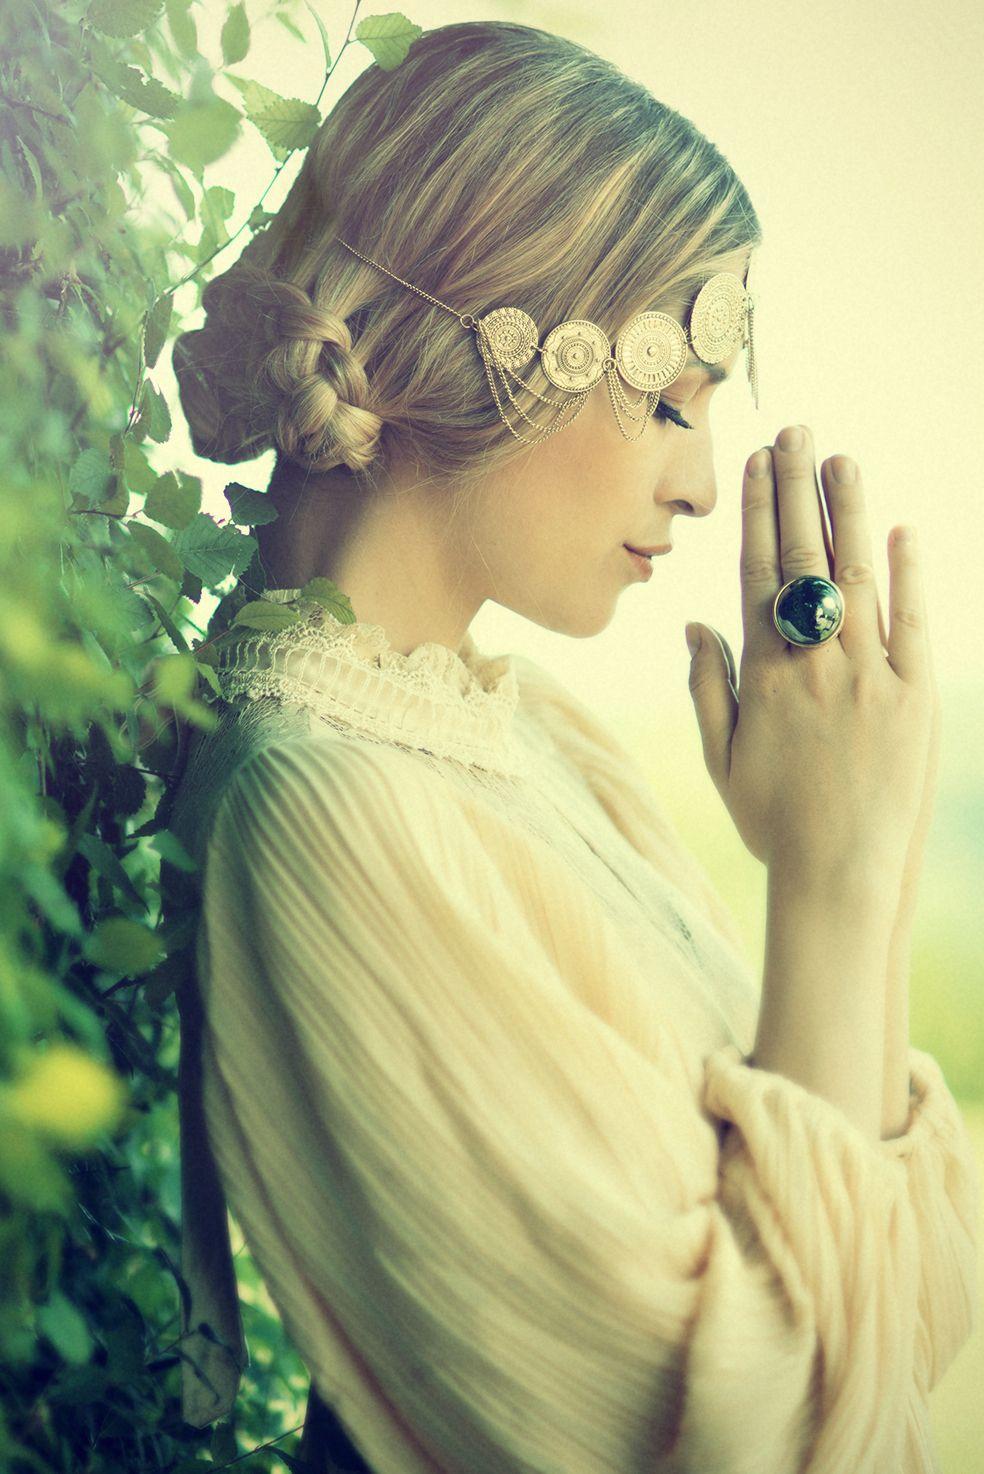 #fashion #beauty #fantasy #photography #portraits www.gabrielladimuro.com